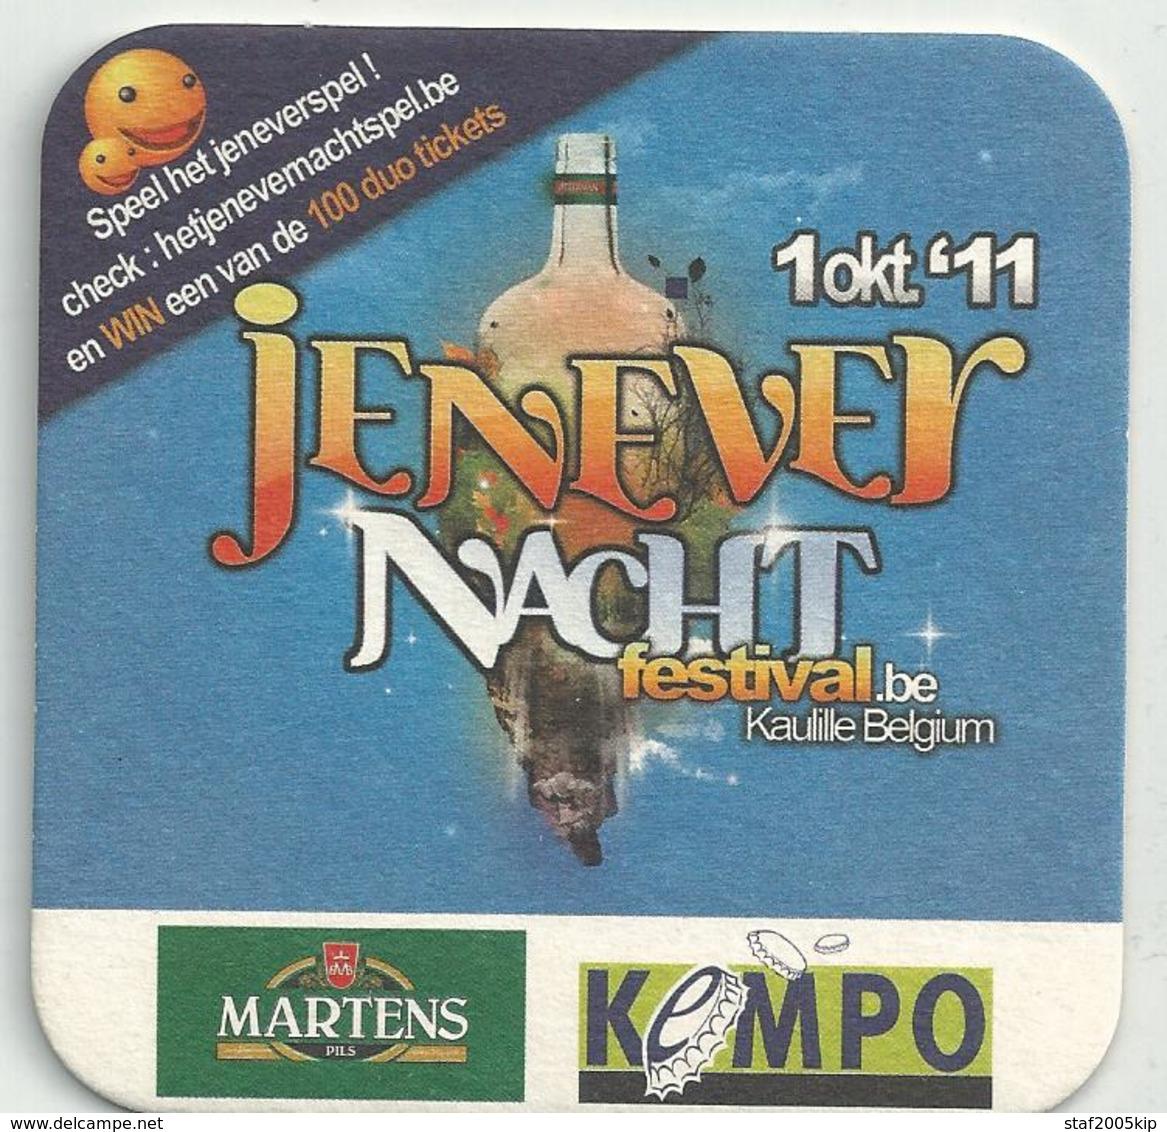 Bierviltje - Jenever Nachtfestival Kaulille 2011 - Martens Pils - KEMPO - Sous-bocks